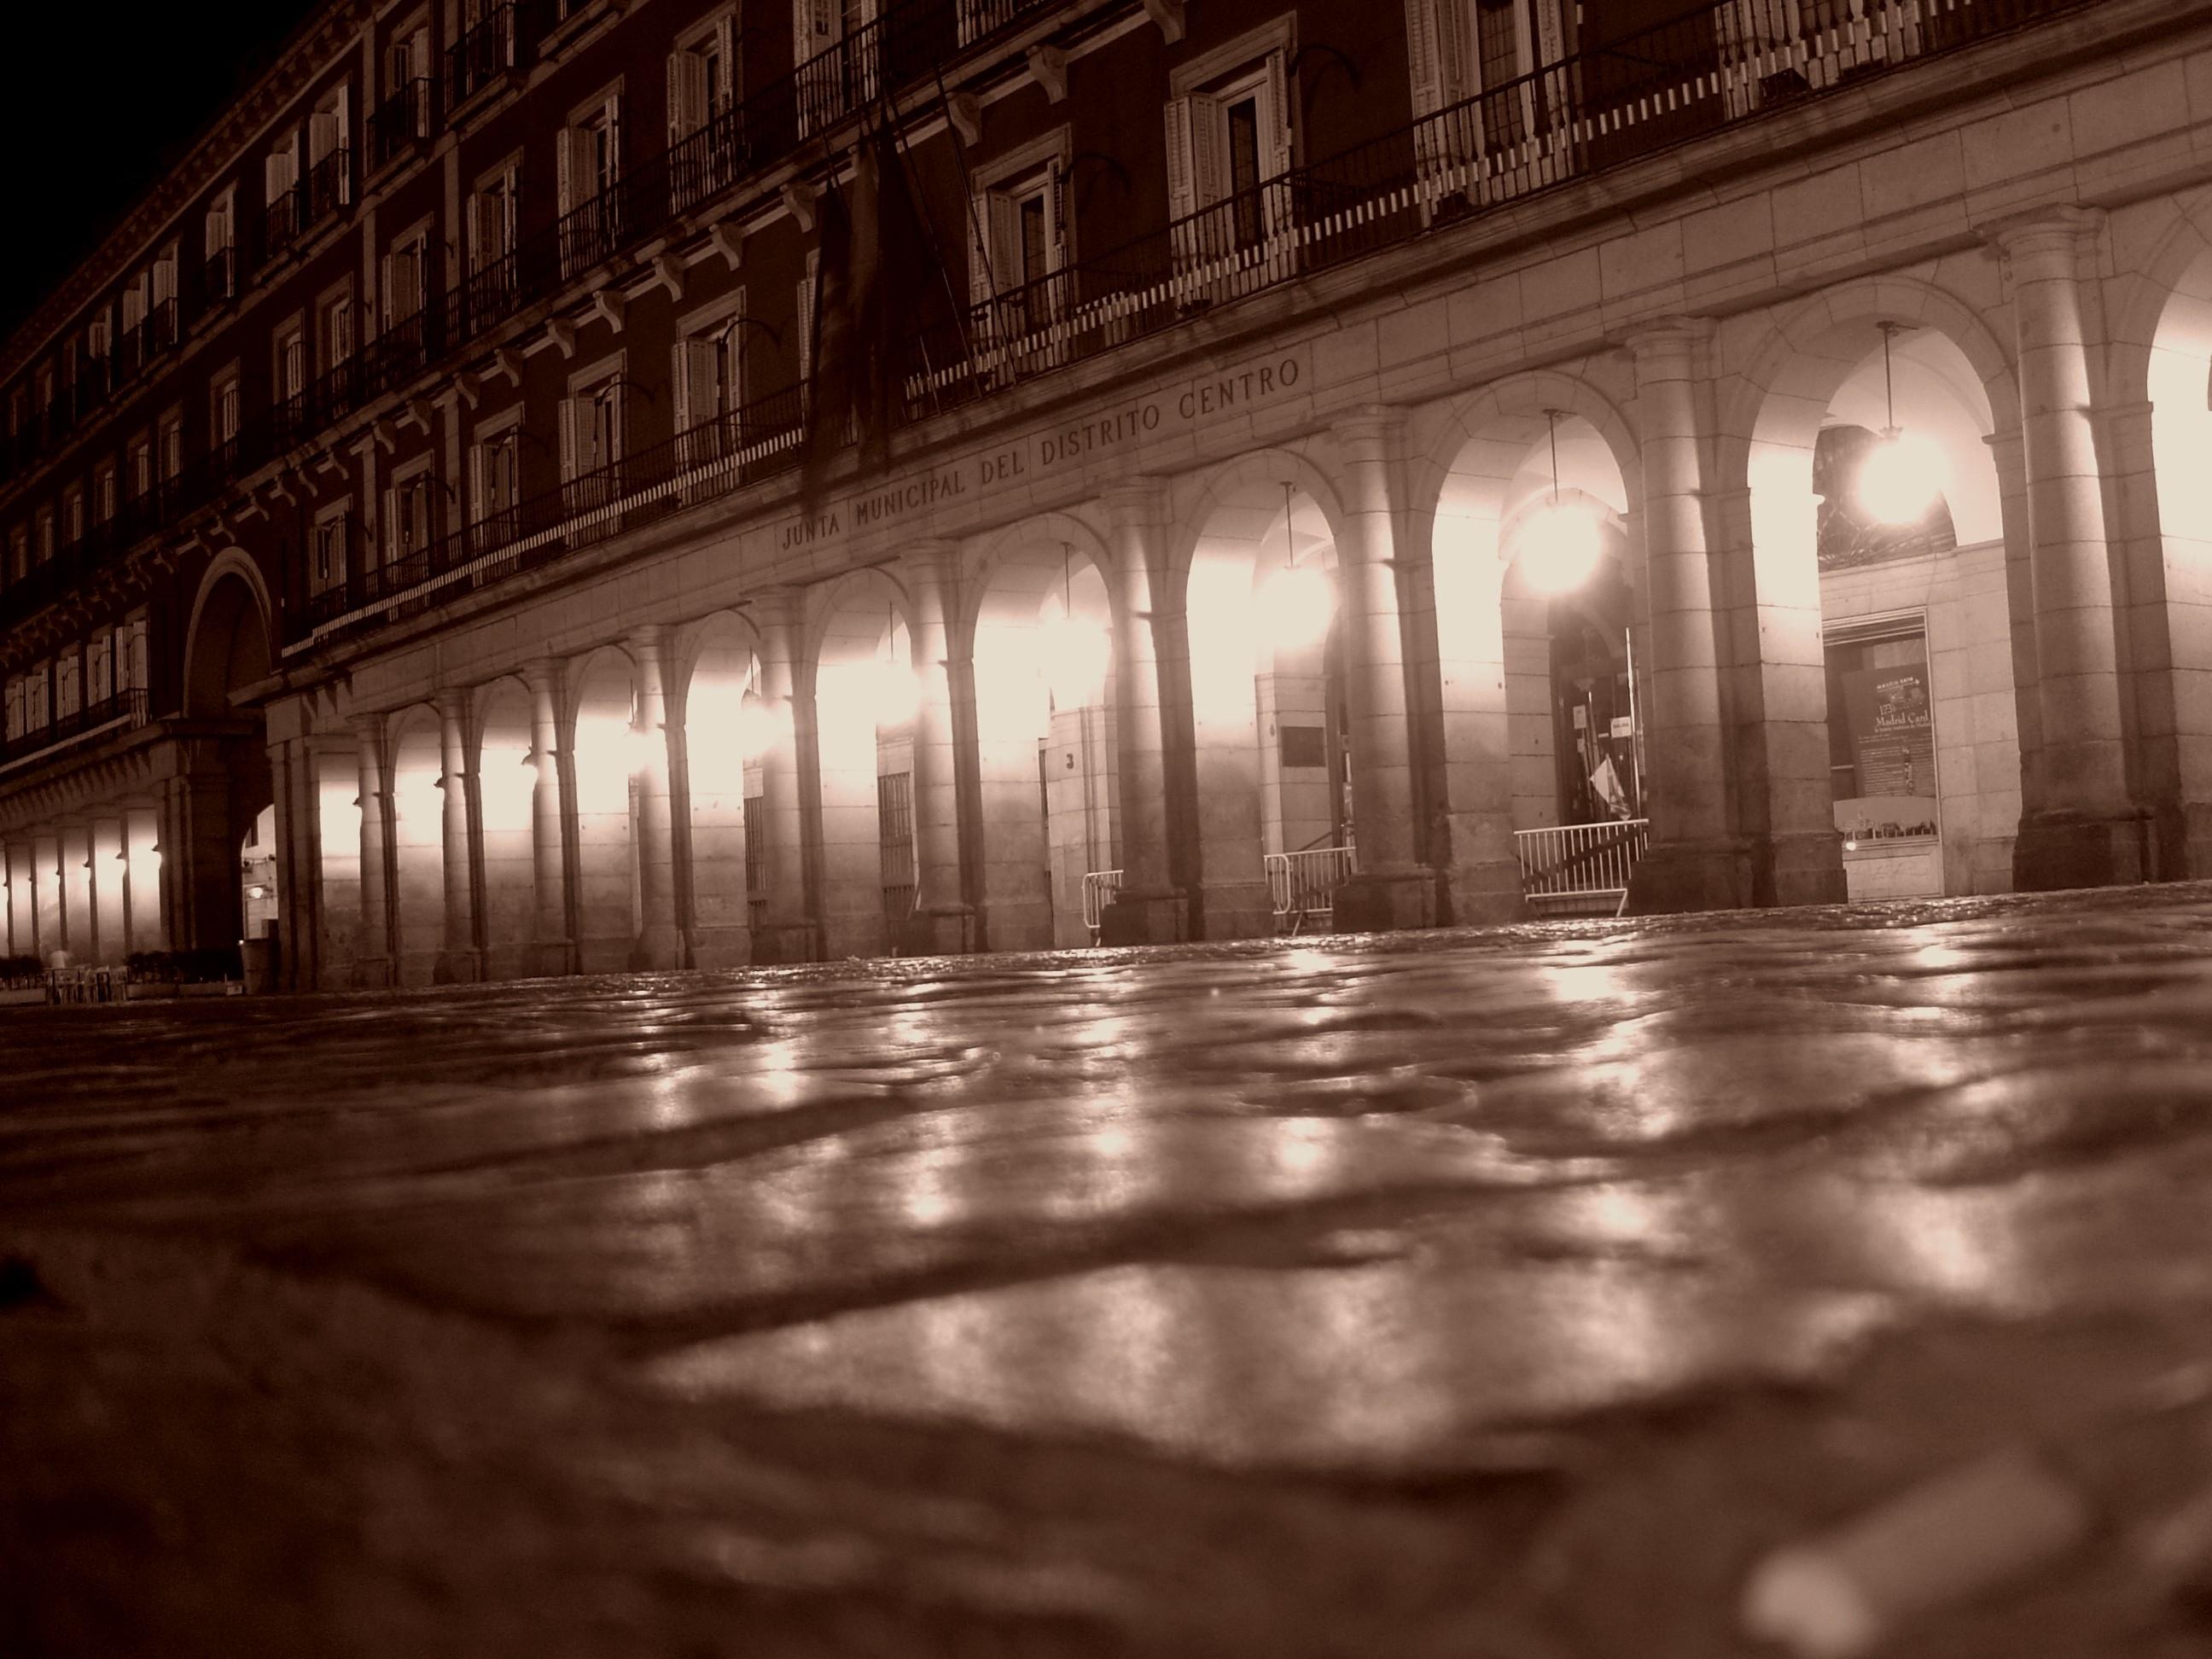 2nd Place (Art & Architecture):  La Plaza Mayor de Madrid